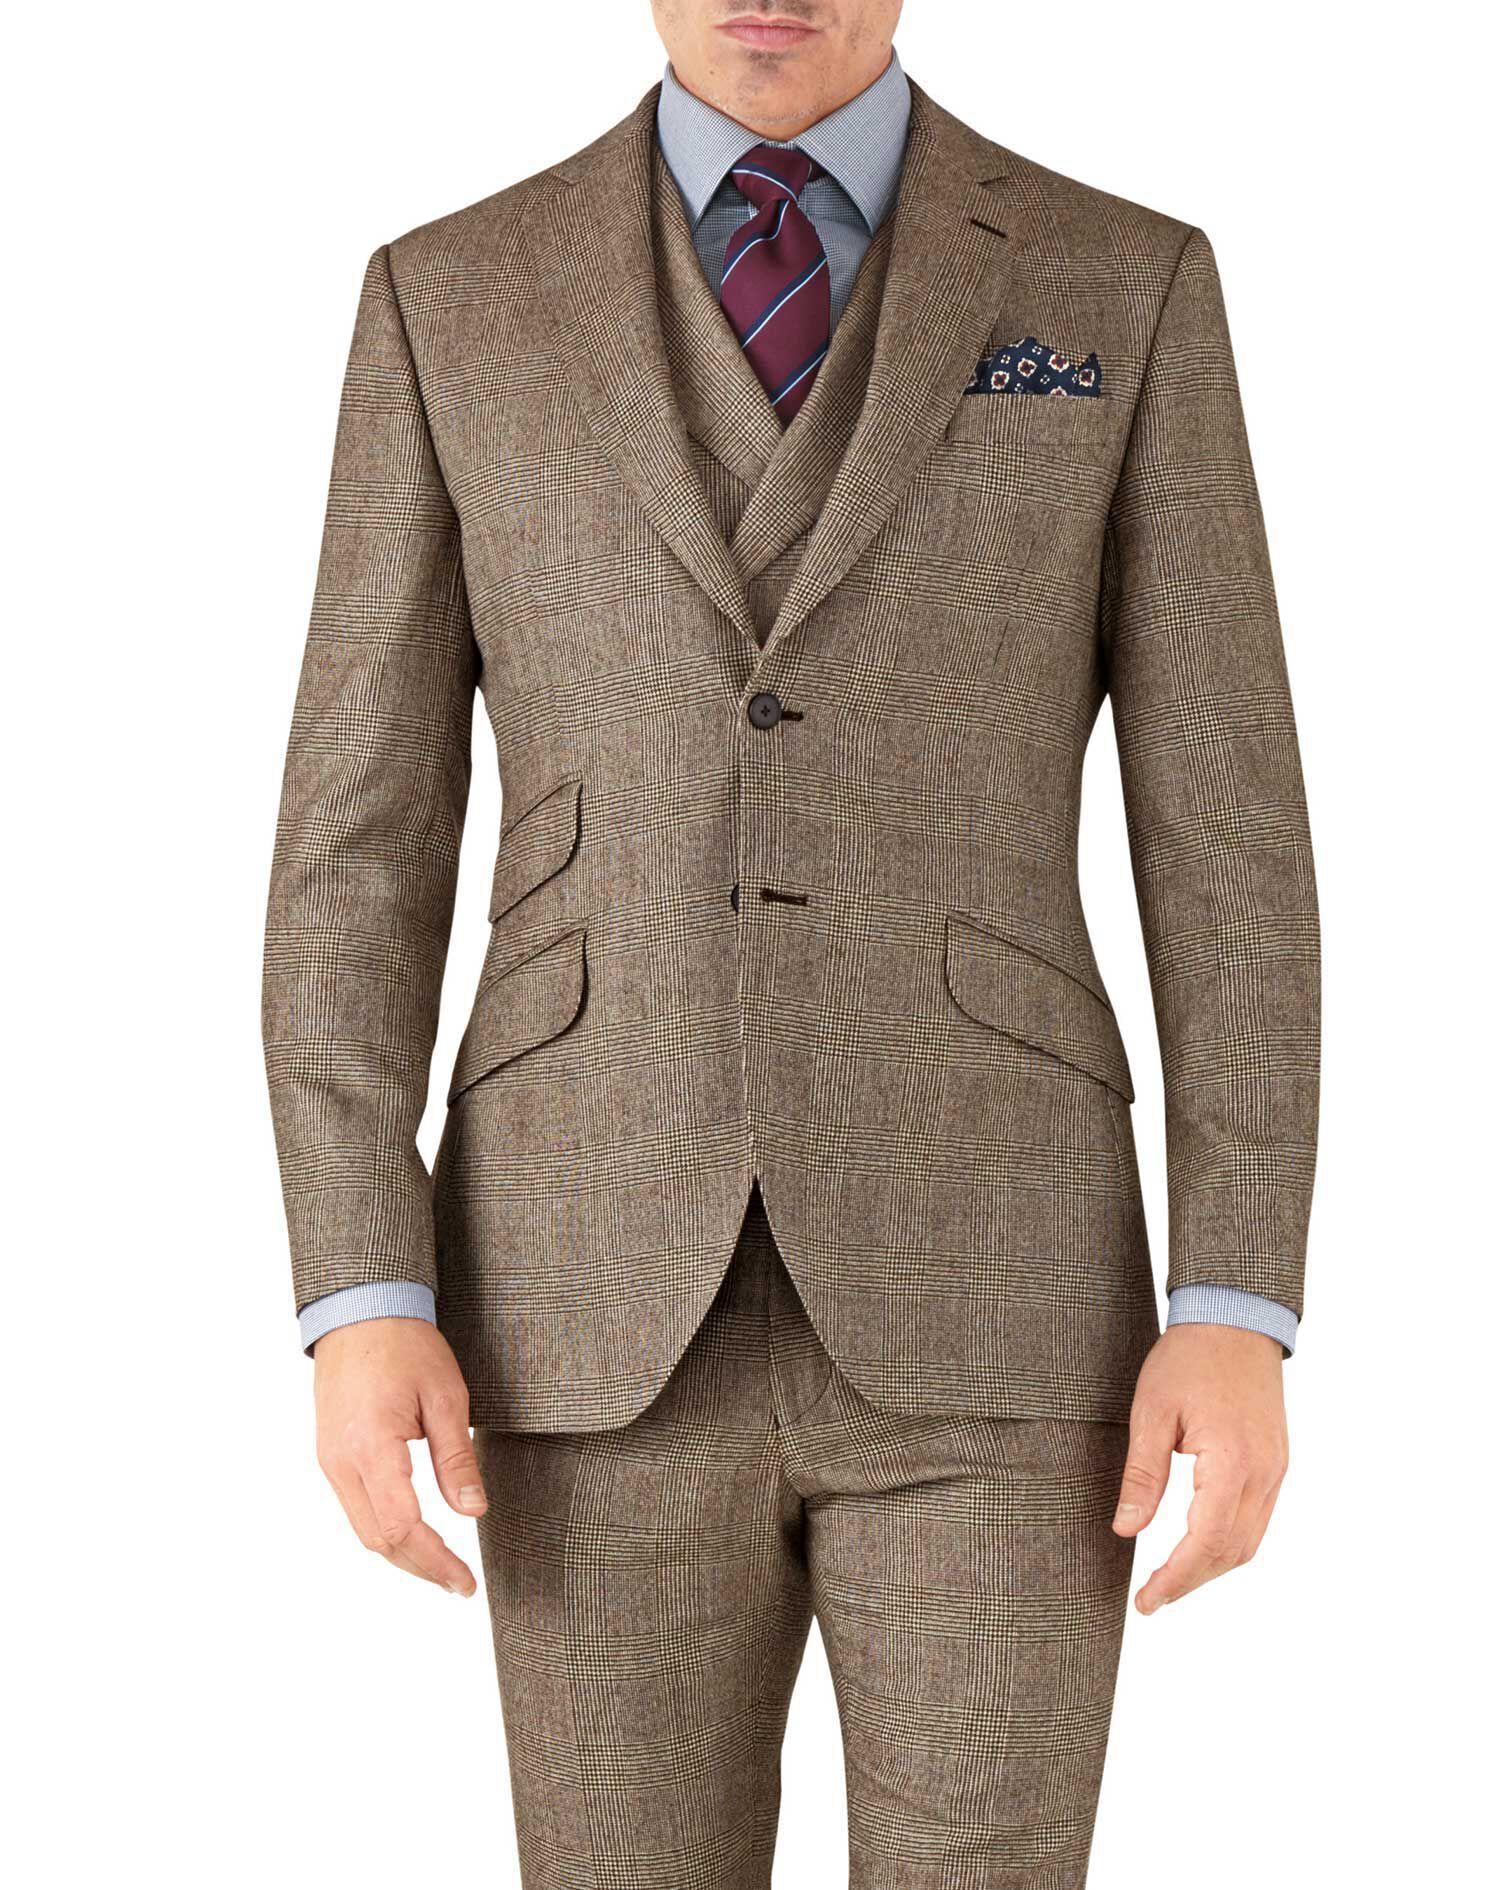 Tan Check Slim Fit British Serge Luxury Suit Wool Jacket Size 46 Long by Charles Tyrwhitt